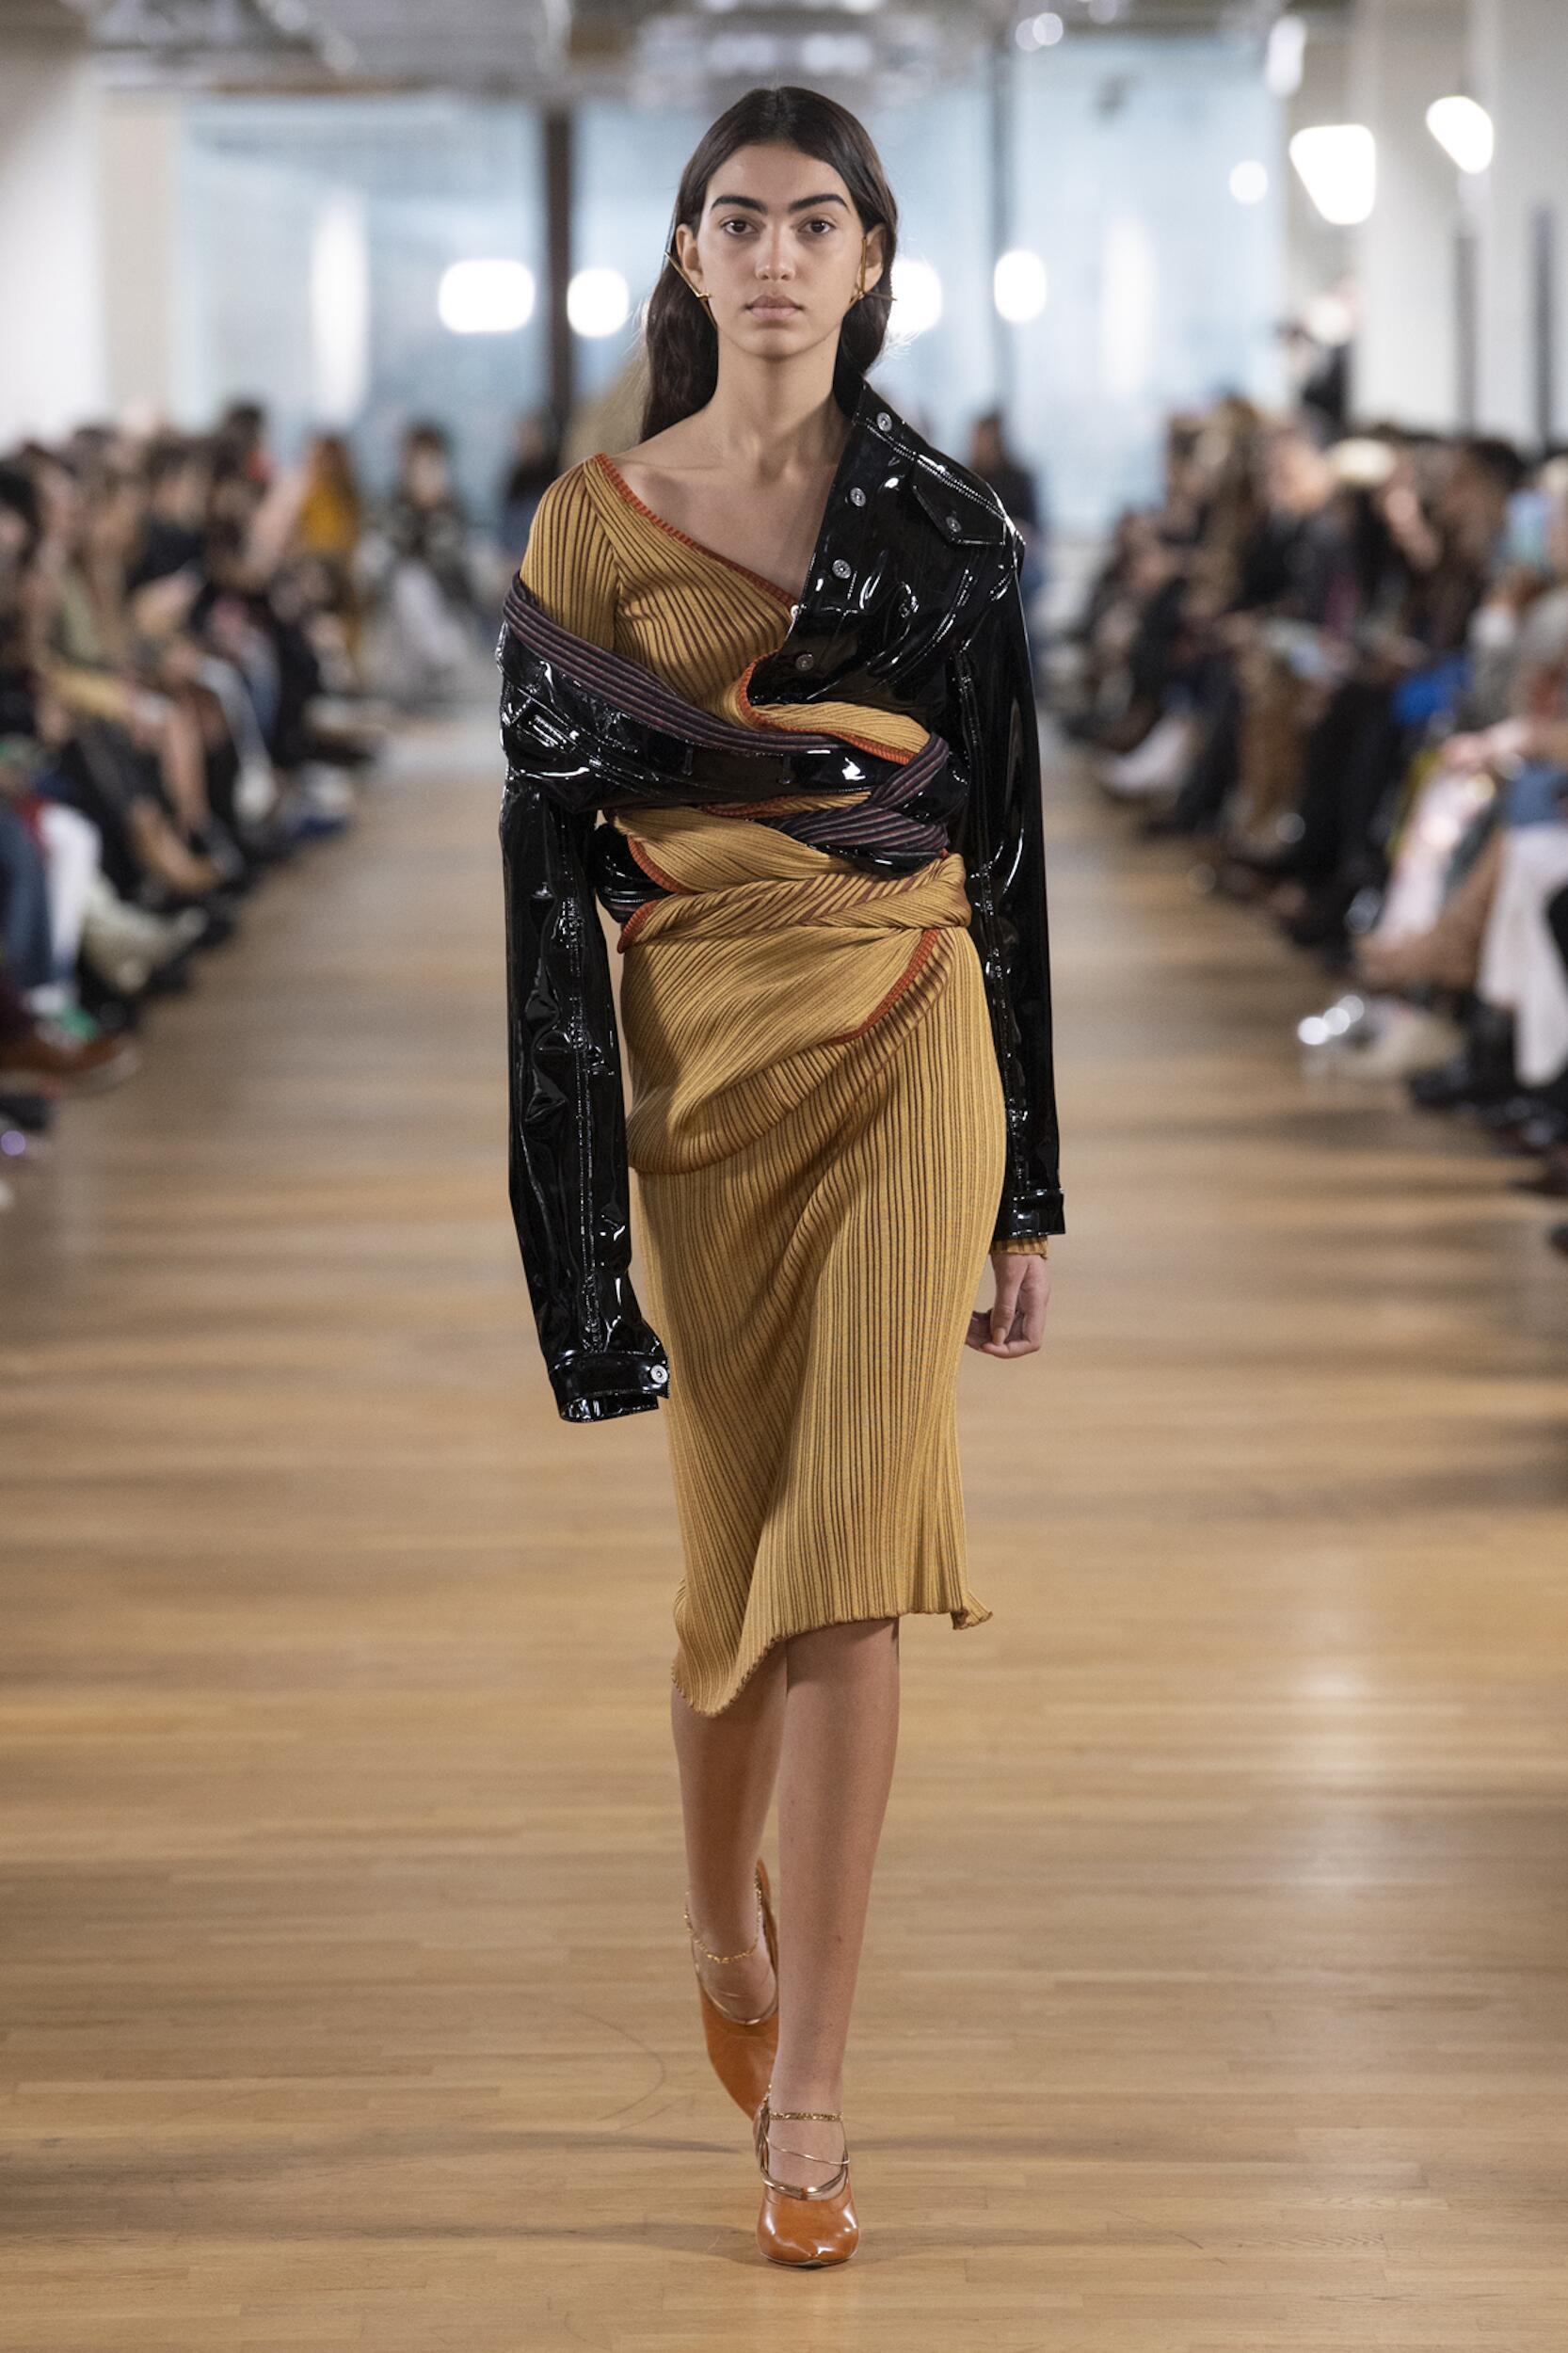 Catwalk Y/Project Women Fashion Show Winter 2020